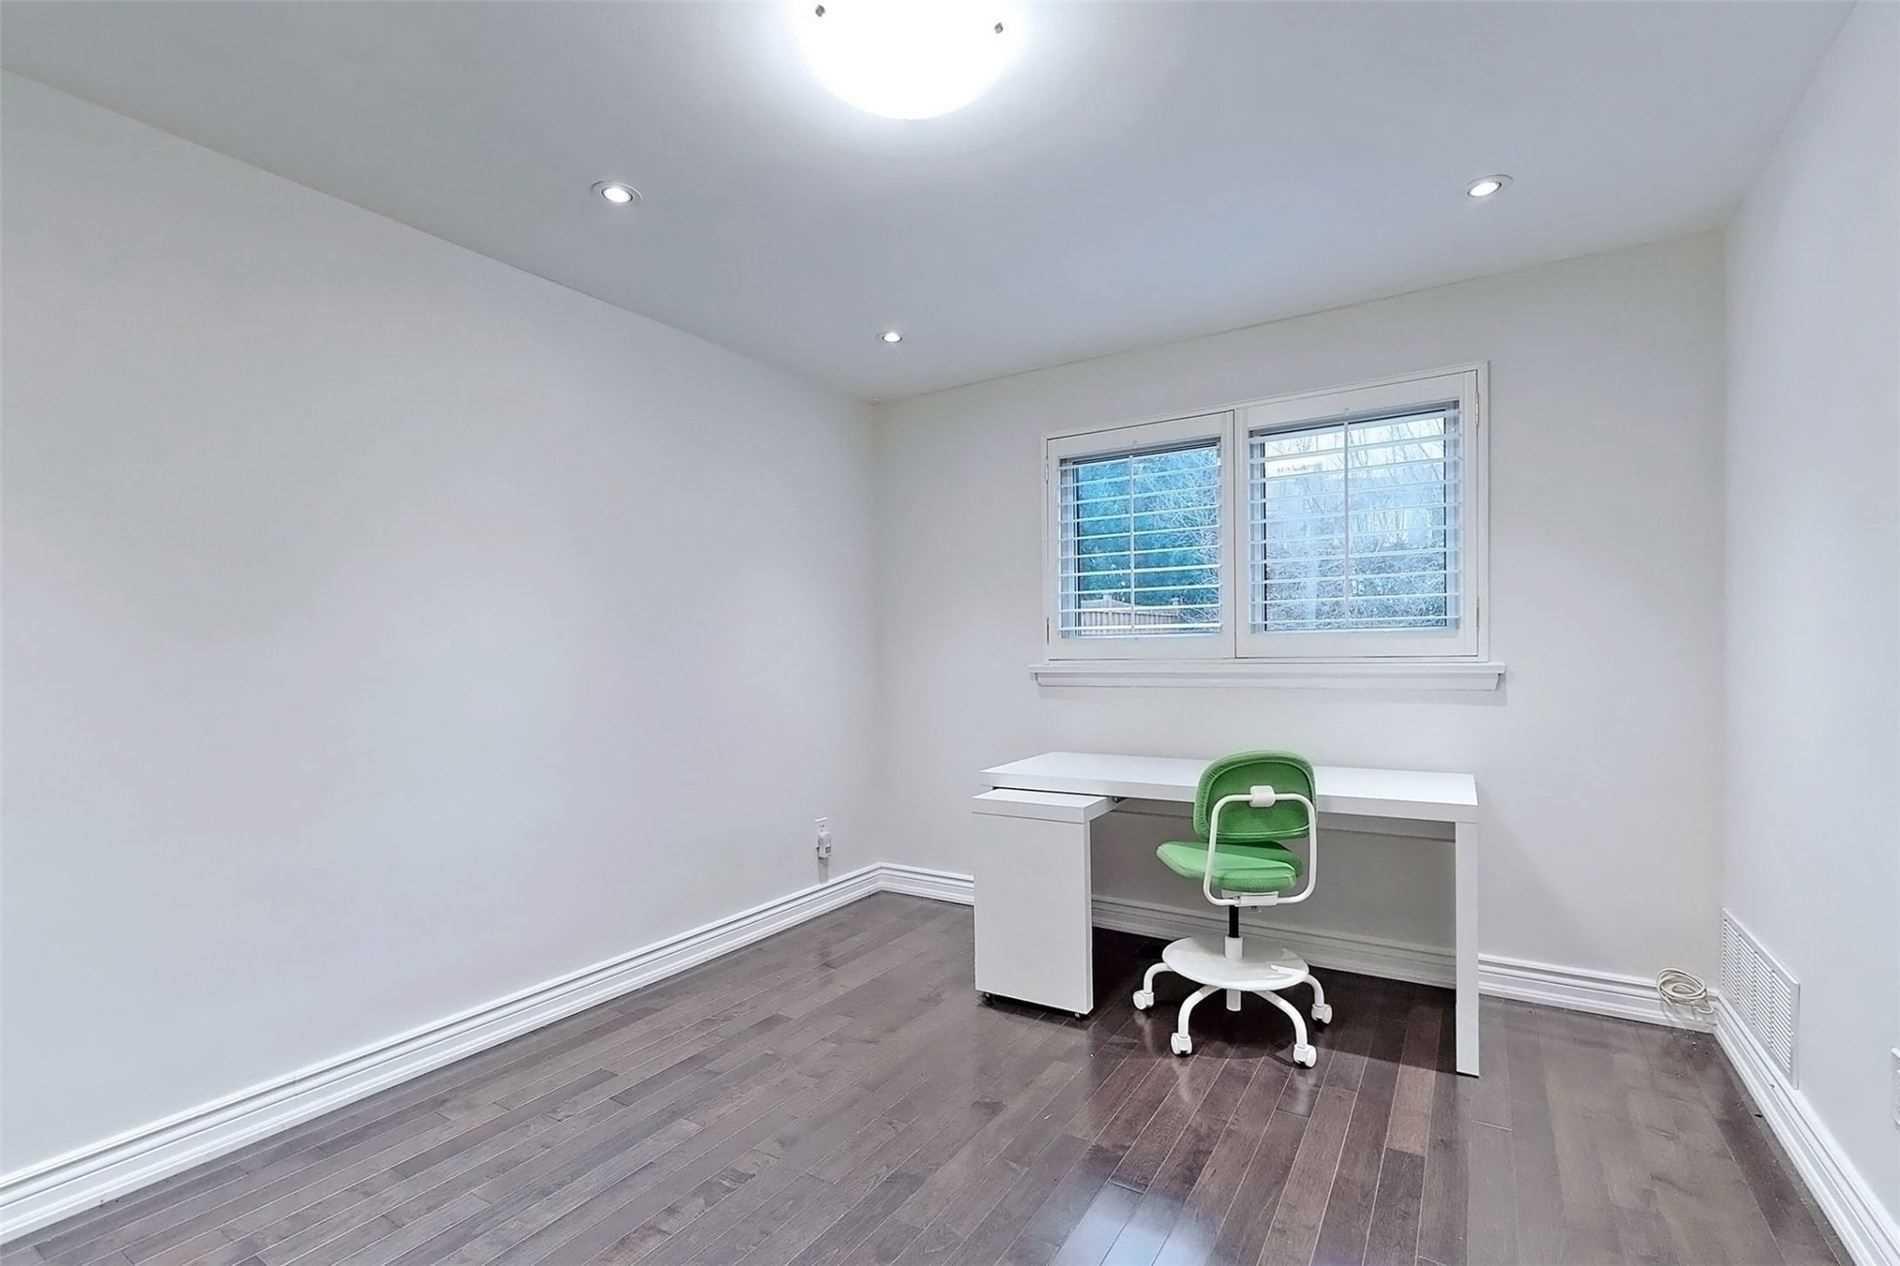 52 Alamosa Dr, Toronto, Ontario M2J2N9, 3 Bedrooms Bedrooms, 12 Rooms Rooms,3 BathroomsBathrooms,Detached,For Sale,Alamosa,C5097977